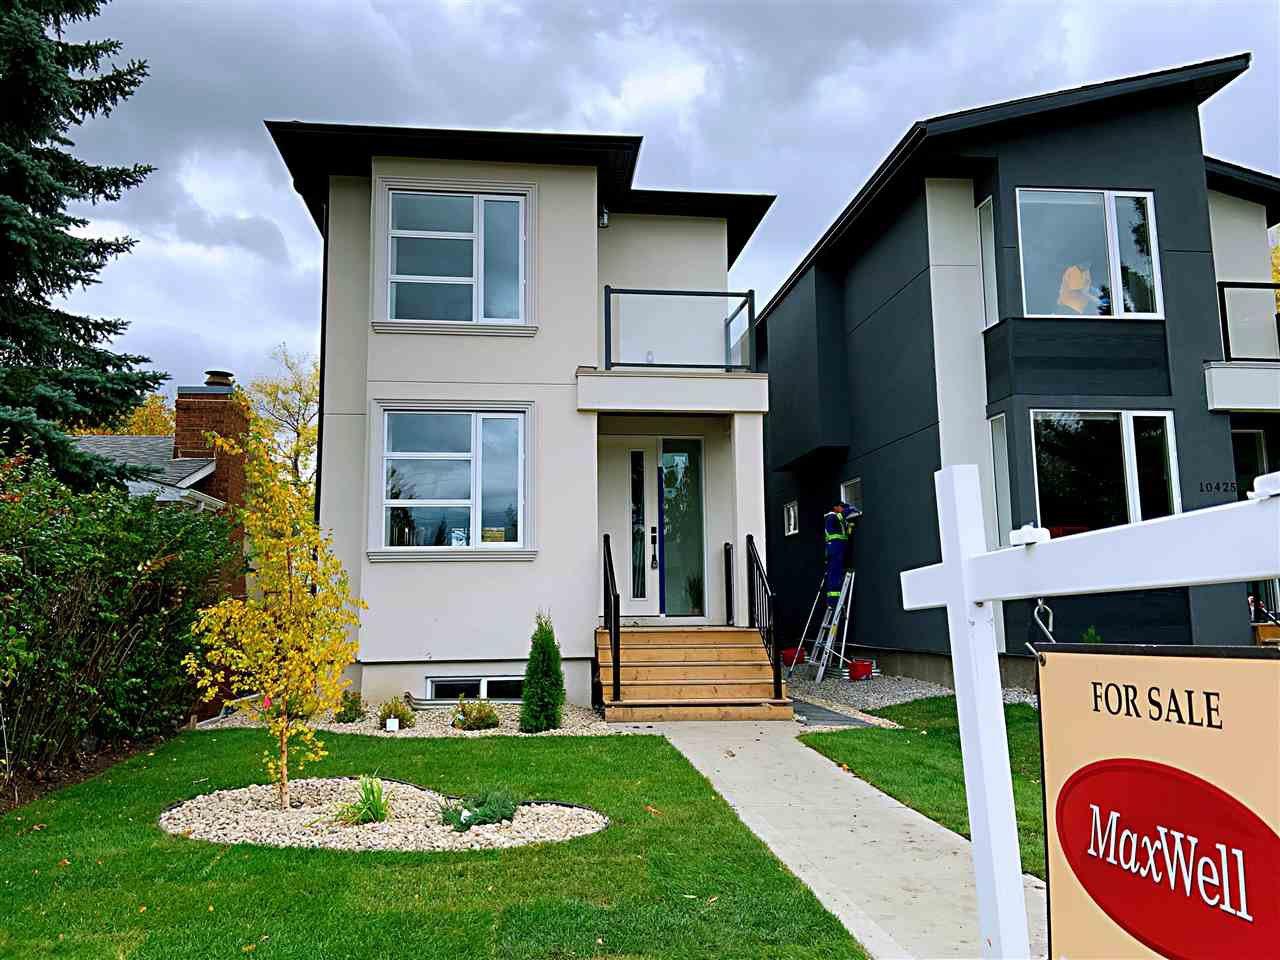 Main Photo: 10423 52 Avenue in Edmonton: Zone 15 House for sale : MLS®# E4174378